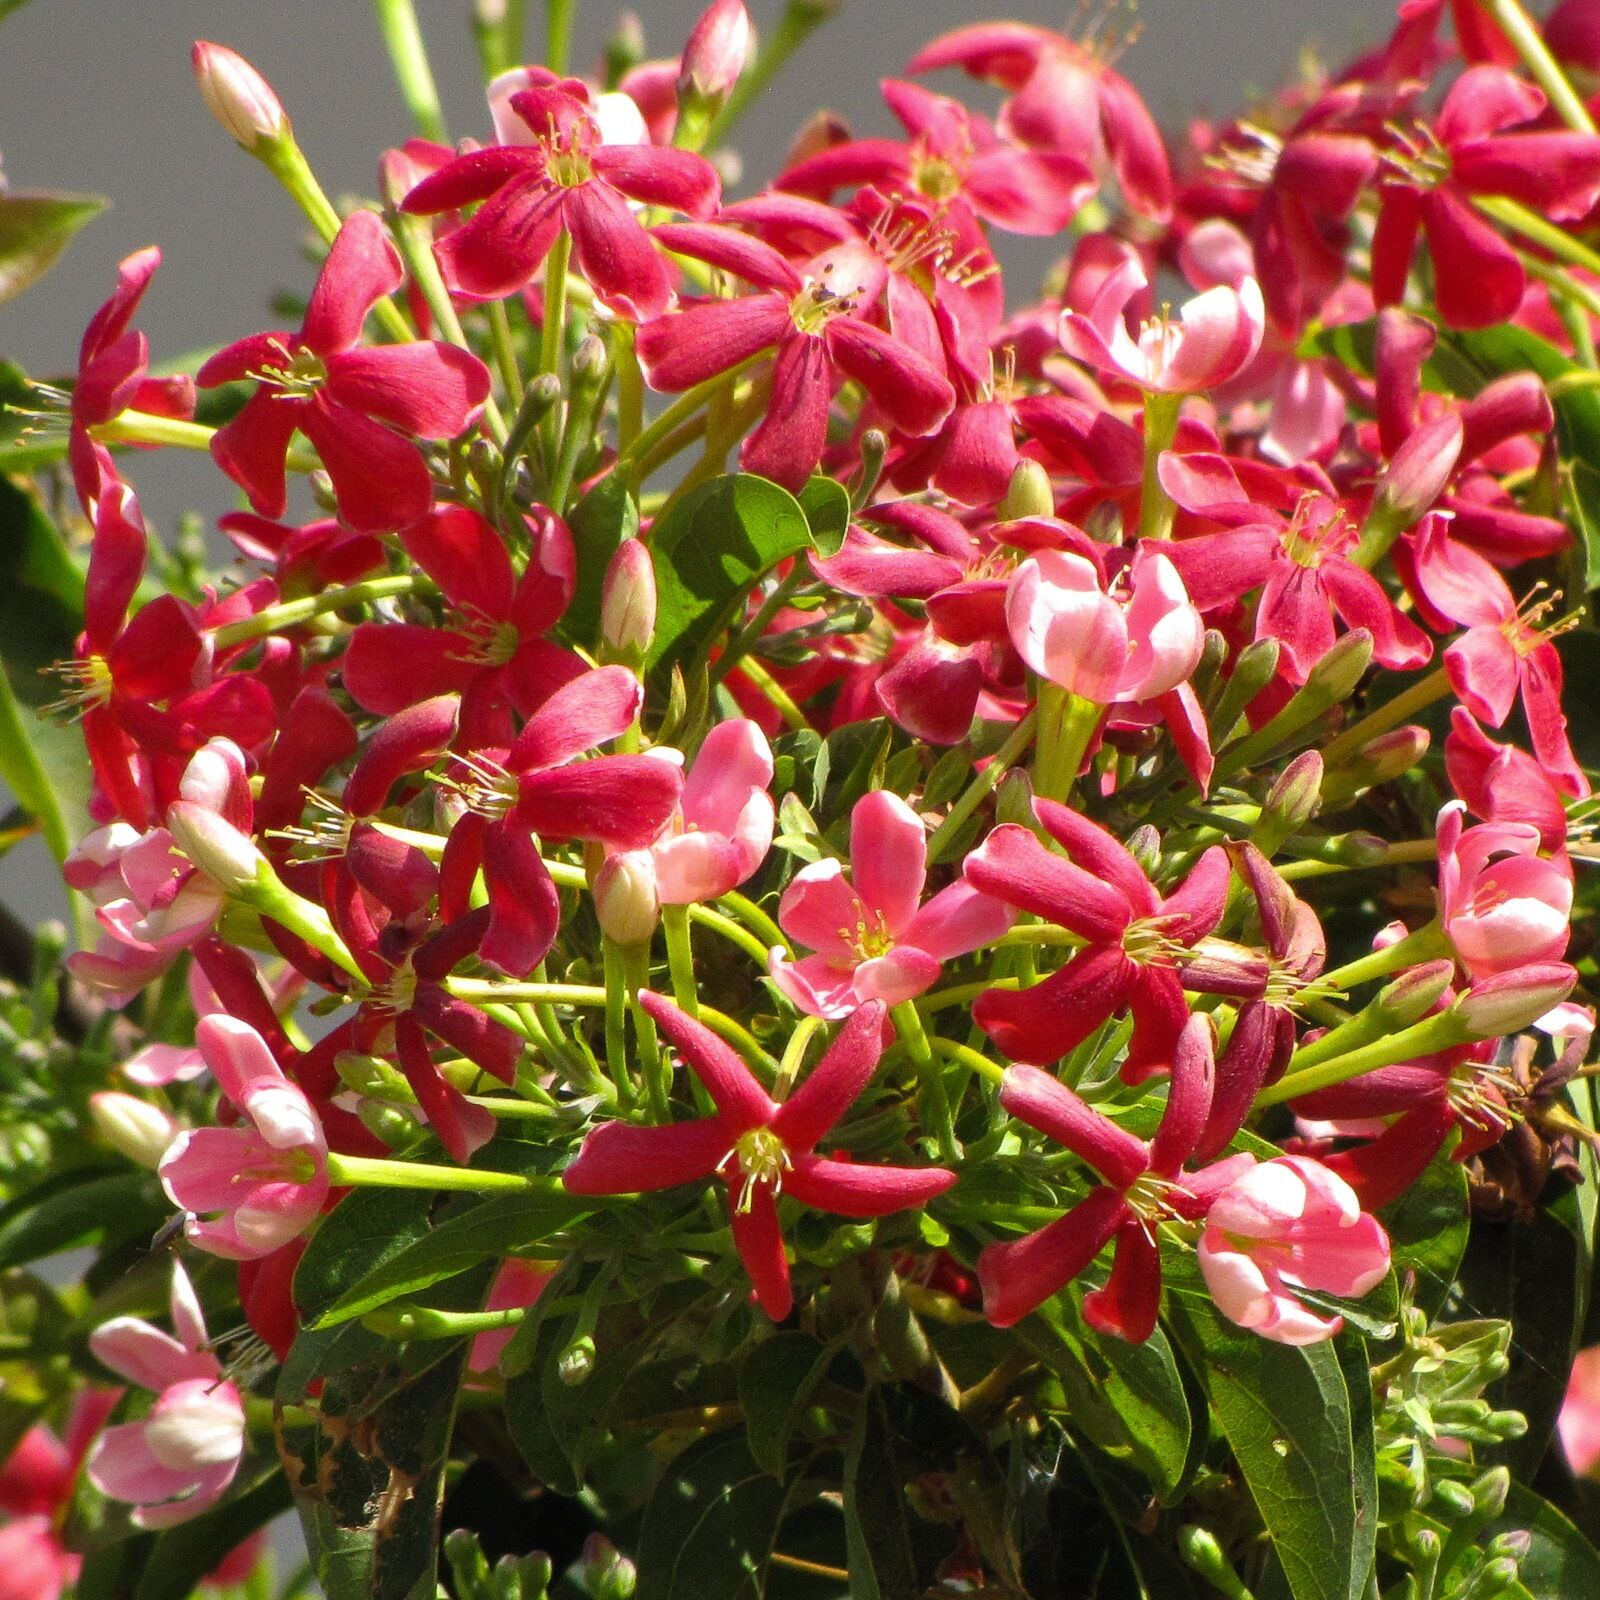 Wundervolle Kletterpflanze•Rangunschlinger•5 Samen//seeds•Quisqualis indica•Duft